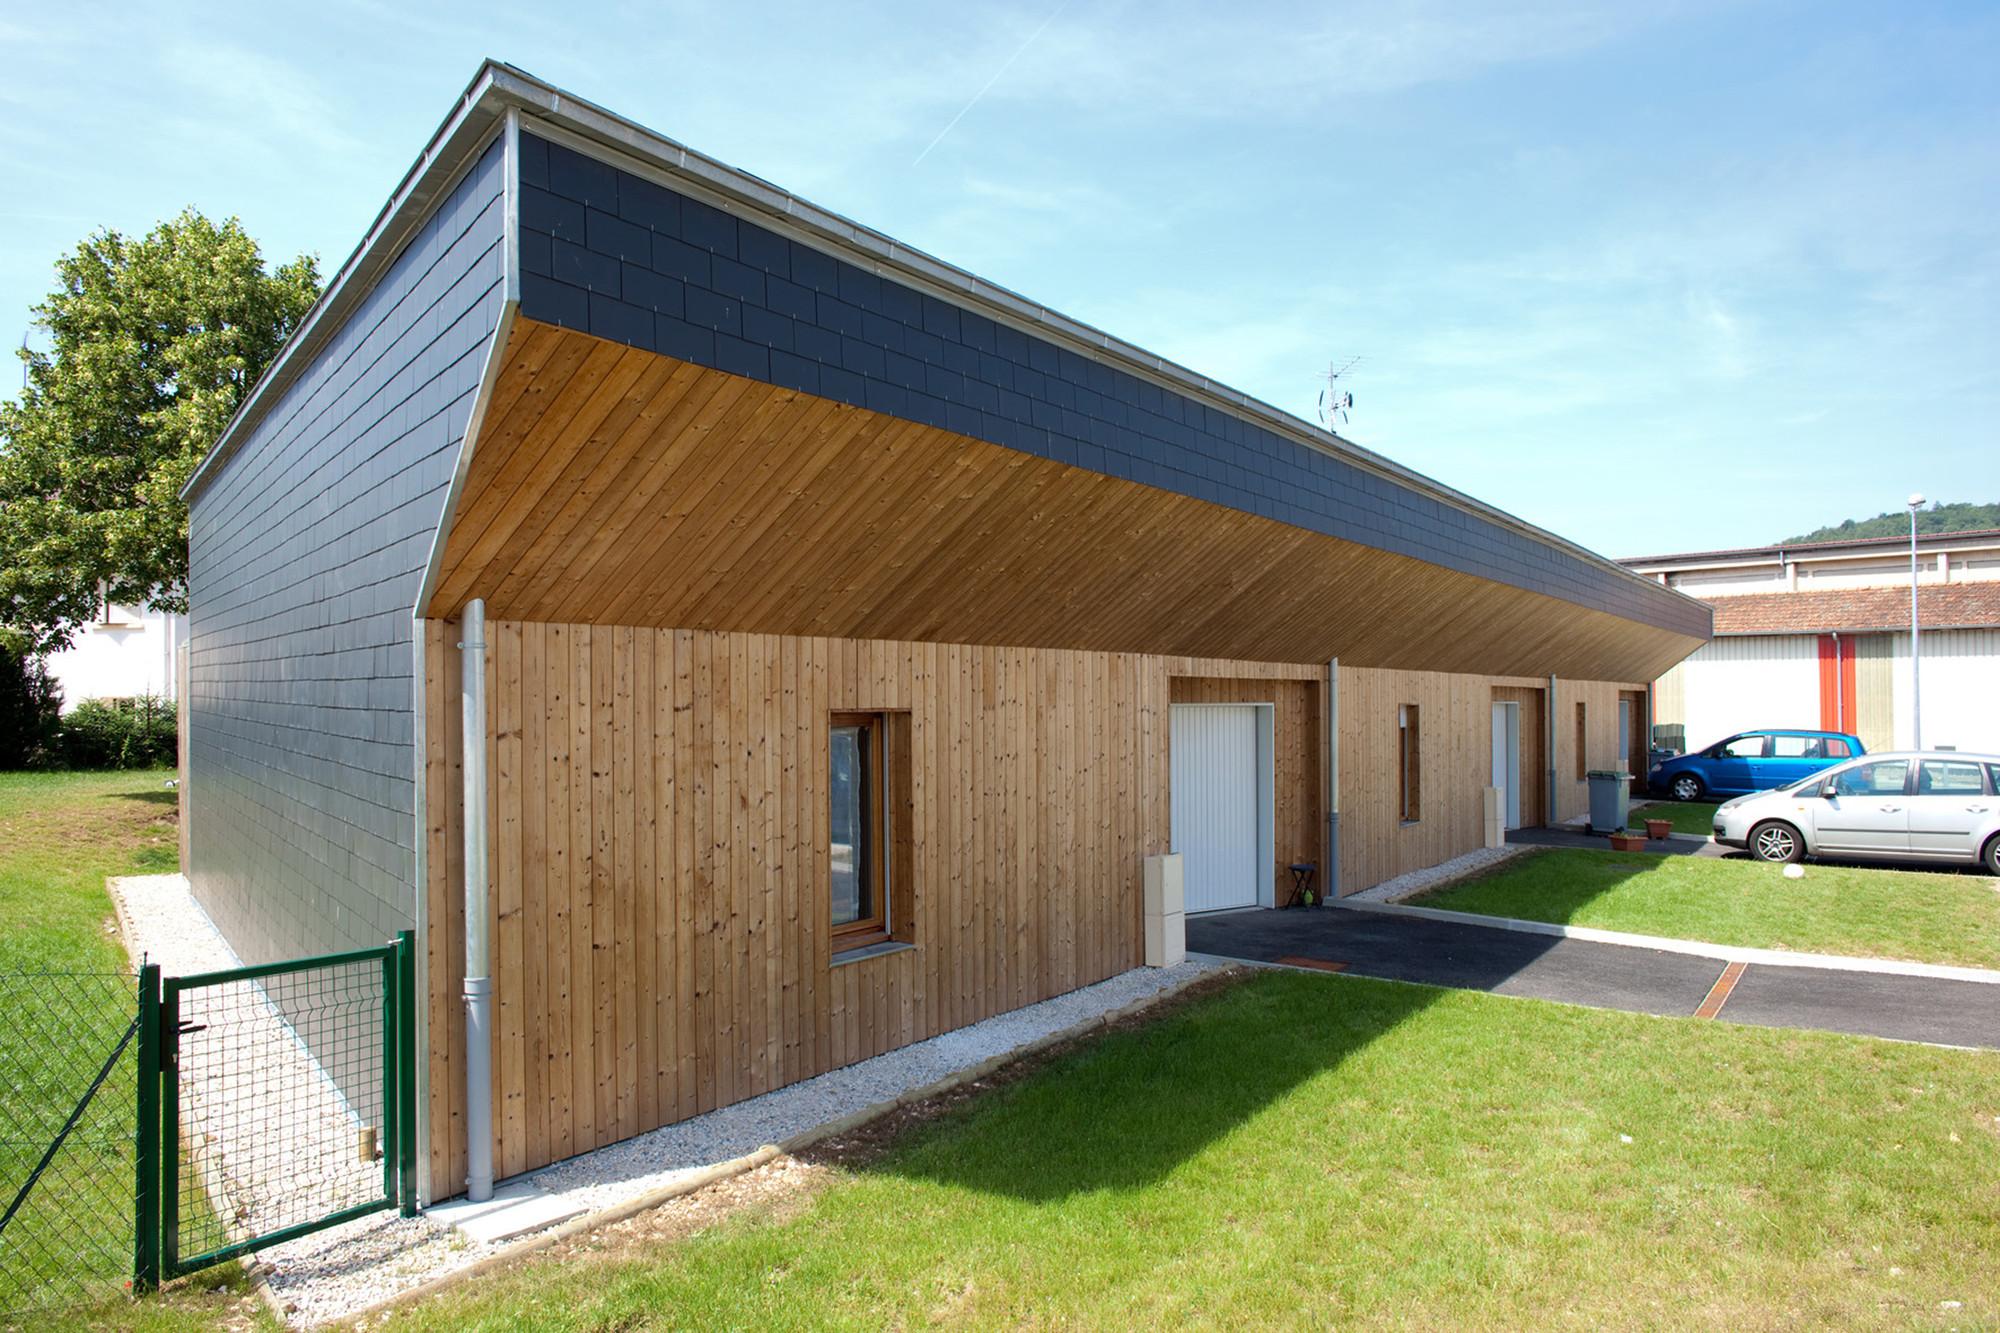 3 Social Houses / Zoomfactor Architectes  + JB Poulain, Courtesy of Zoomfactor Architectes